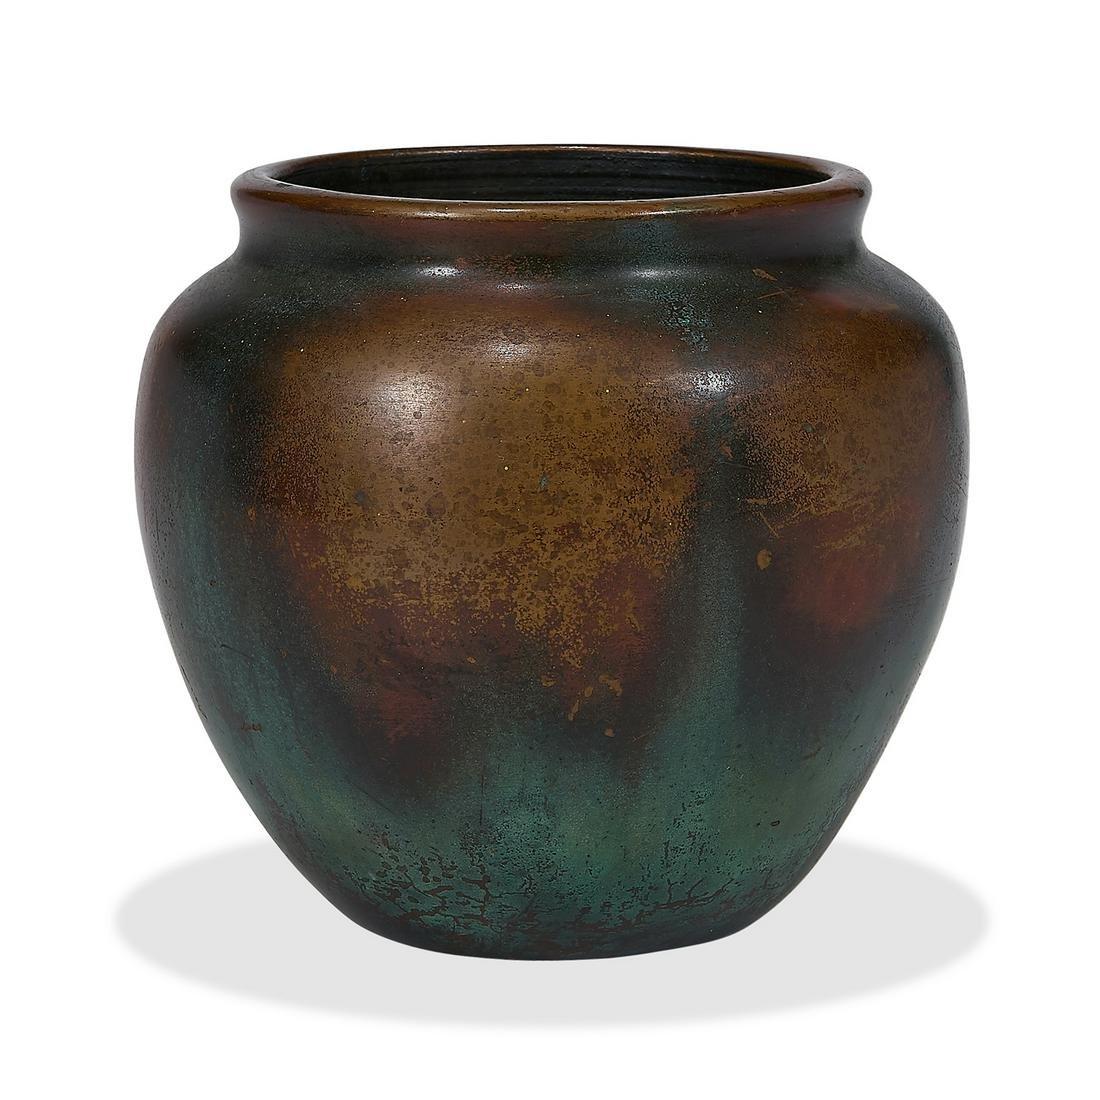 Charles Walter Clewell vase, #440-914